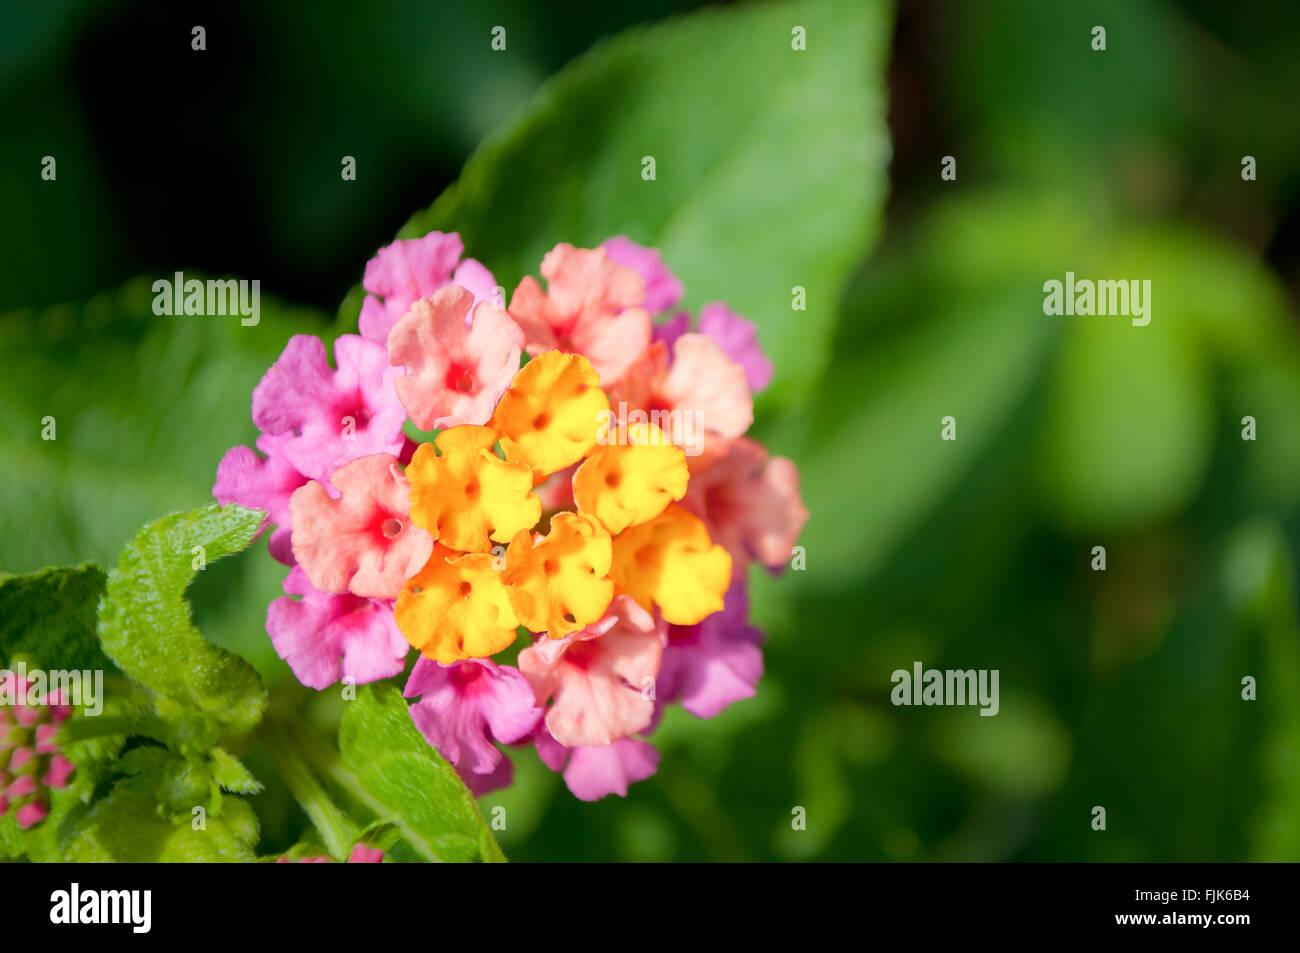 Close up of yellow and pink fower named Lantana Camara, also known as big-sage (Malaysia), wild-sage, red-sage, Stock Photo